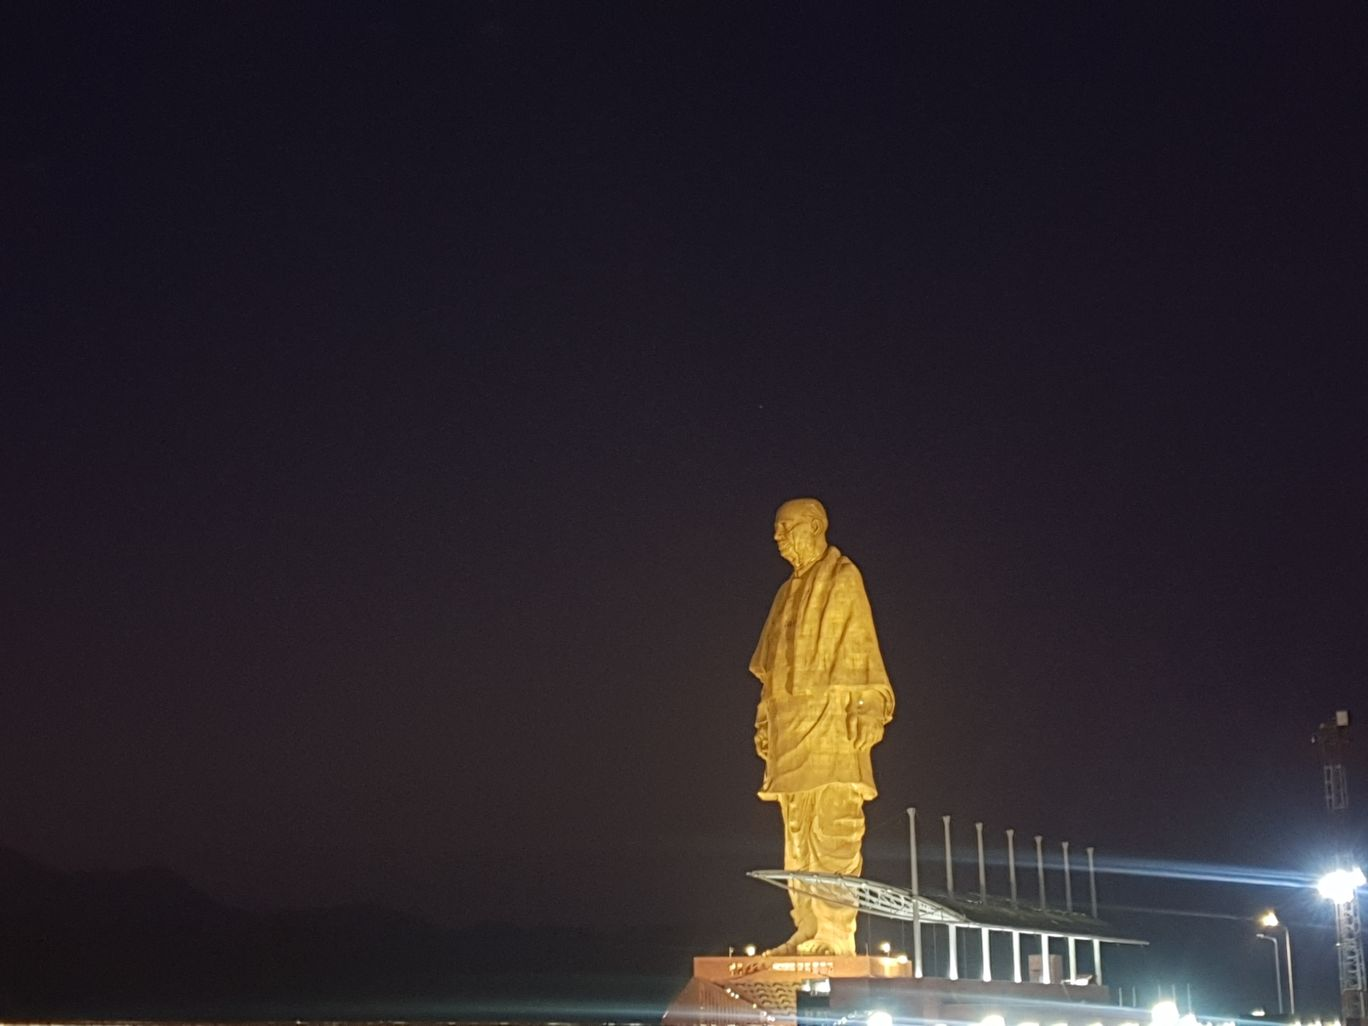 Photo of Gujarat By Prashant Bhat